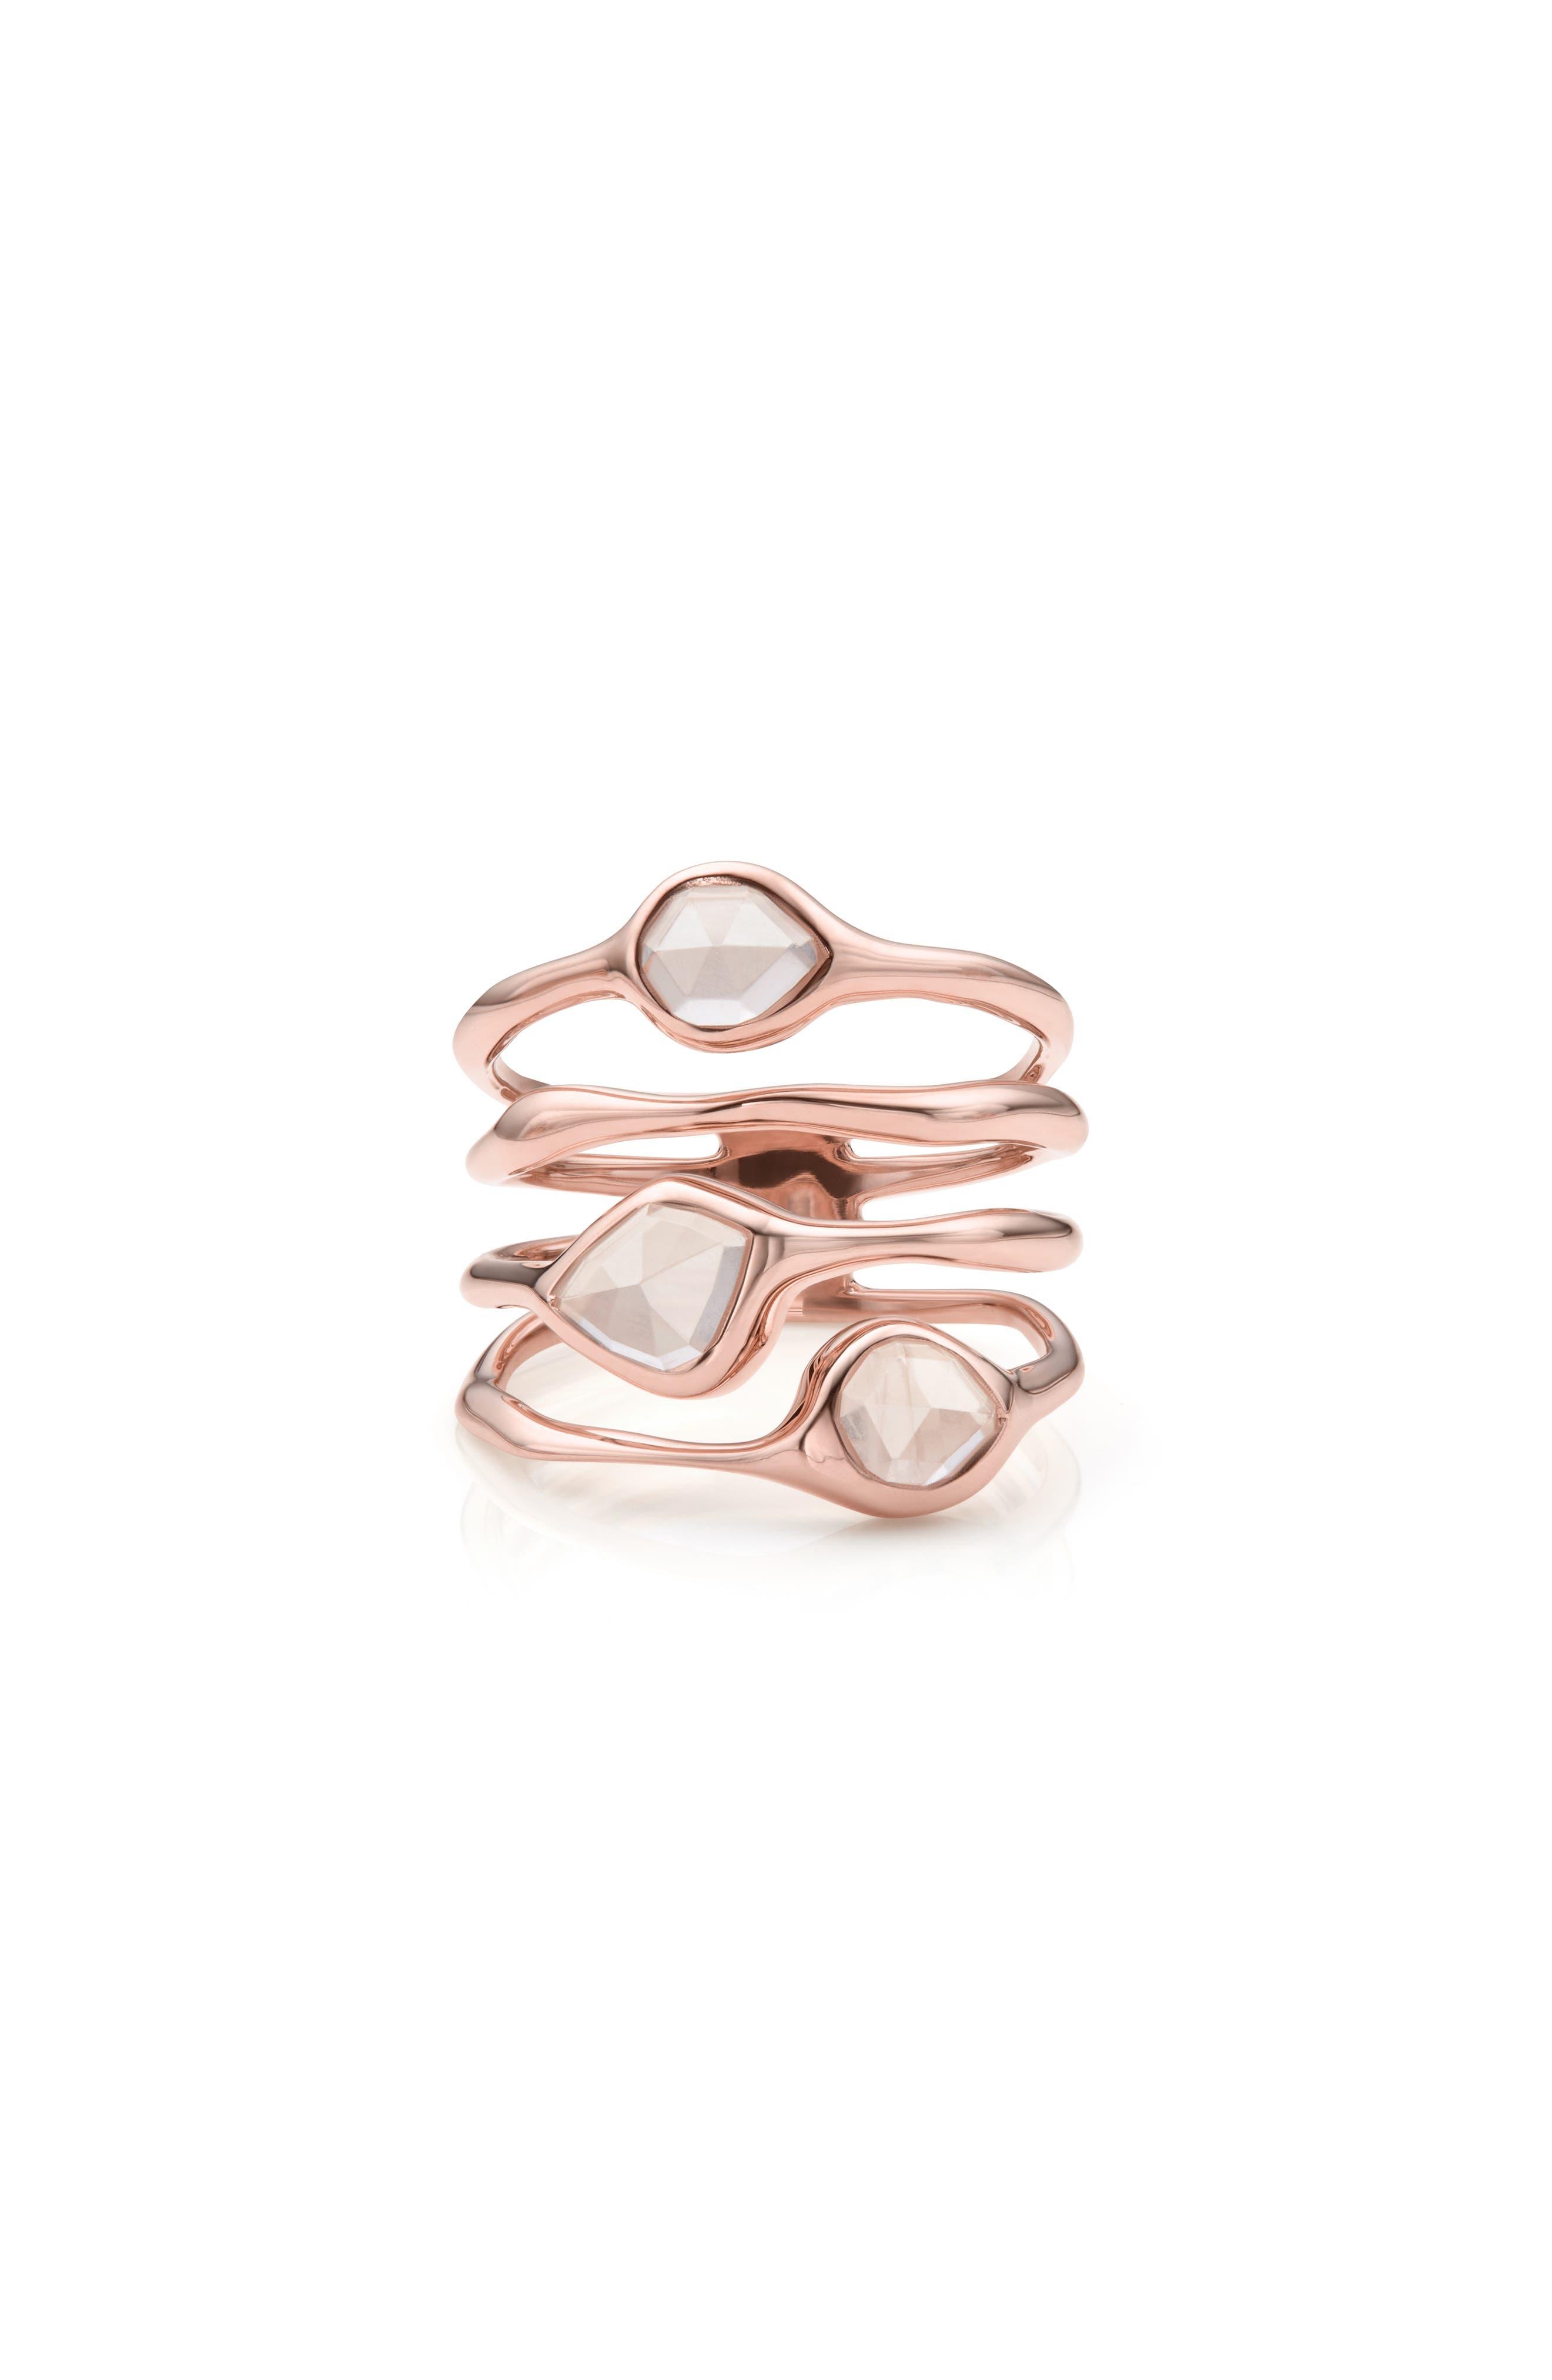 MONICA VINADER, Siren Cluster Cocktail Ring, Main thumbnail 1, color, ROSE GOLD/ ROSE QUARTZ